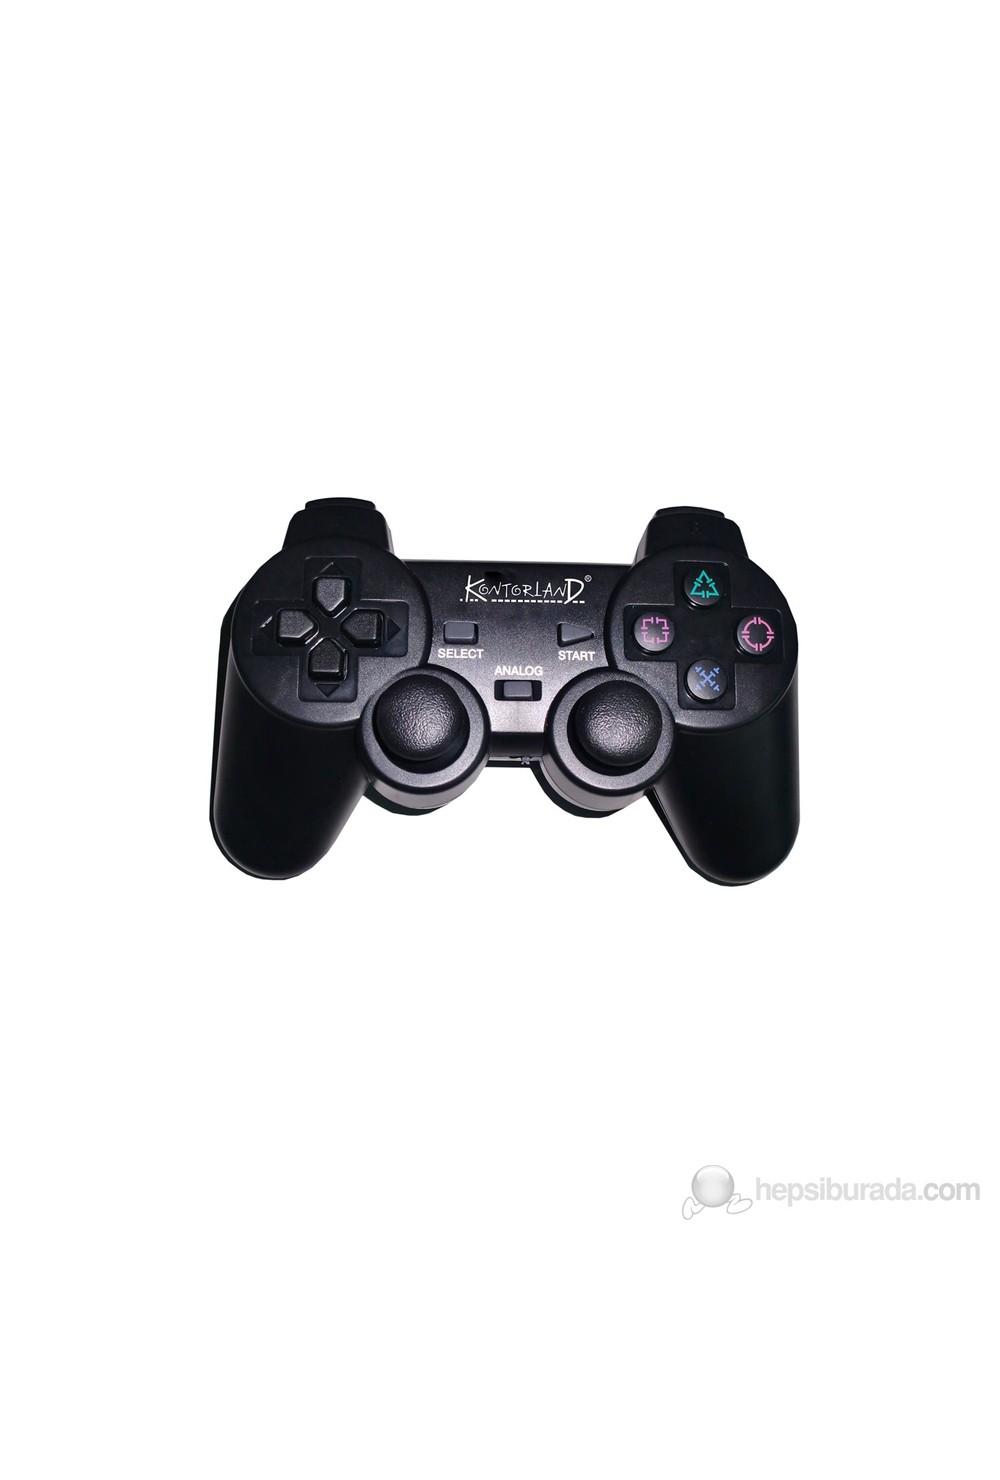 Driver PAD PS3 PC